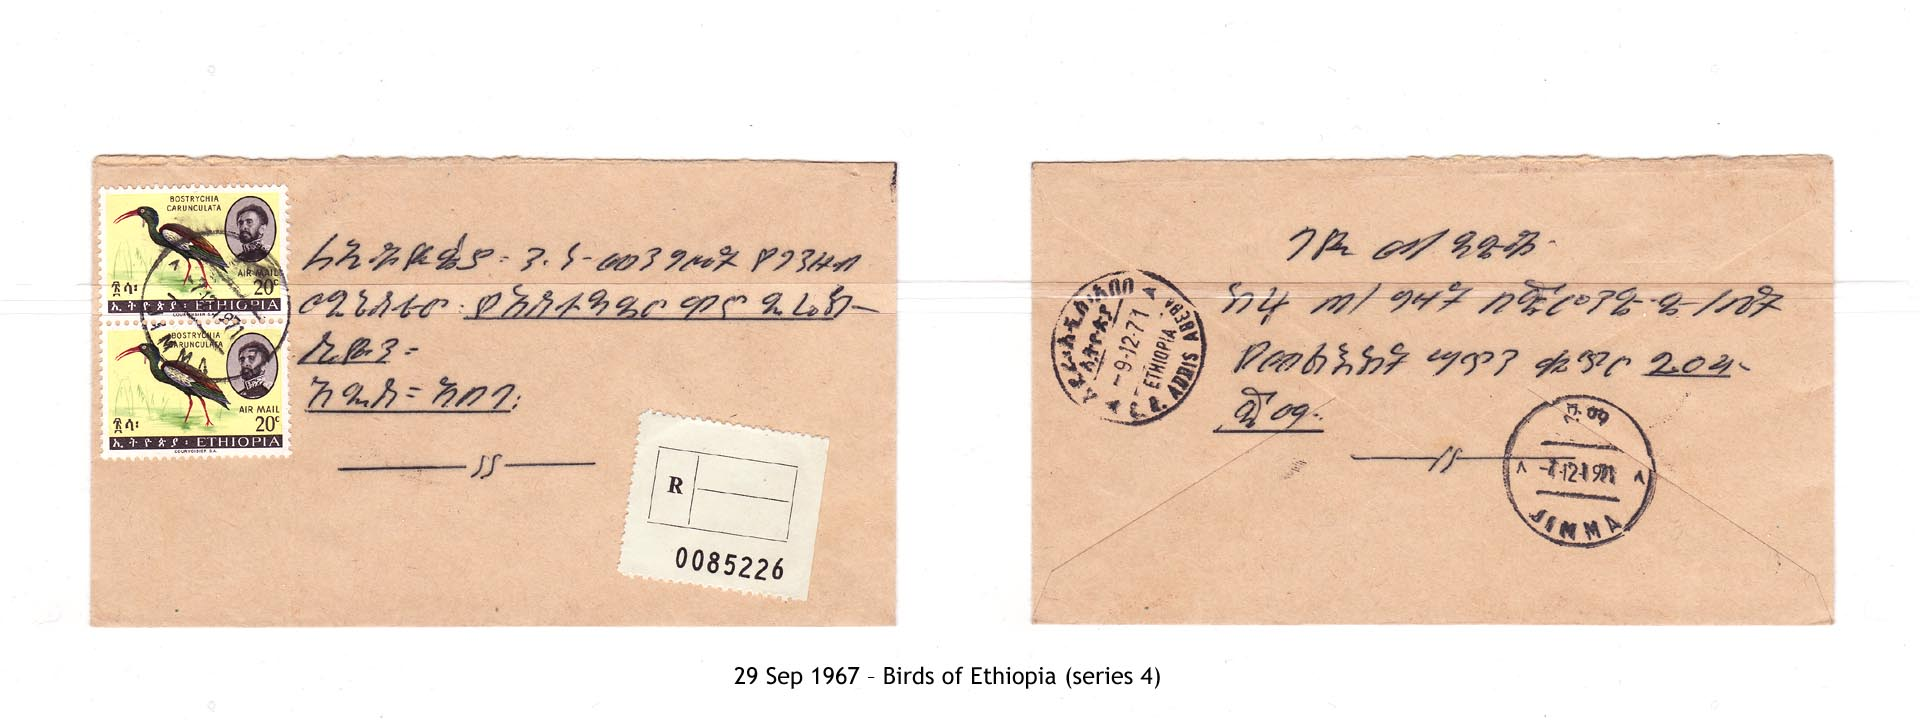 19670929 – Birds of Ethiopia (series 4)